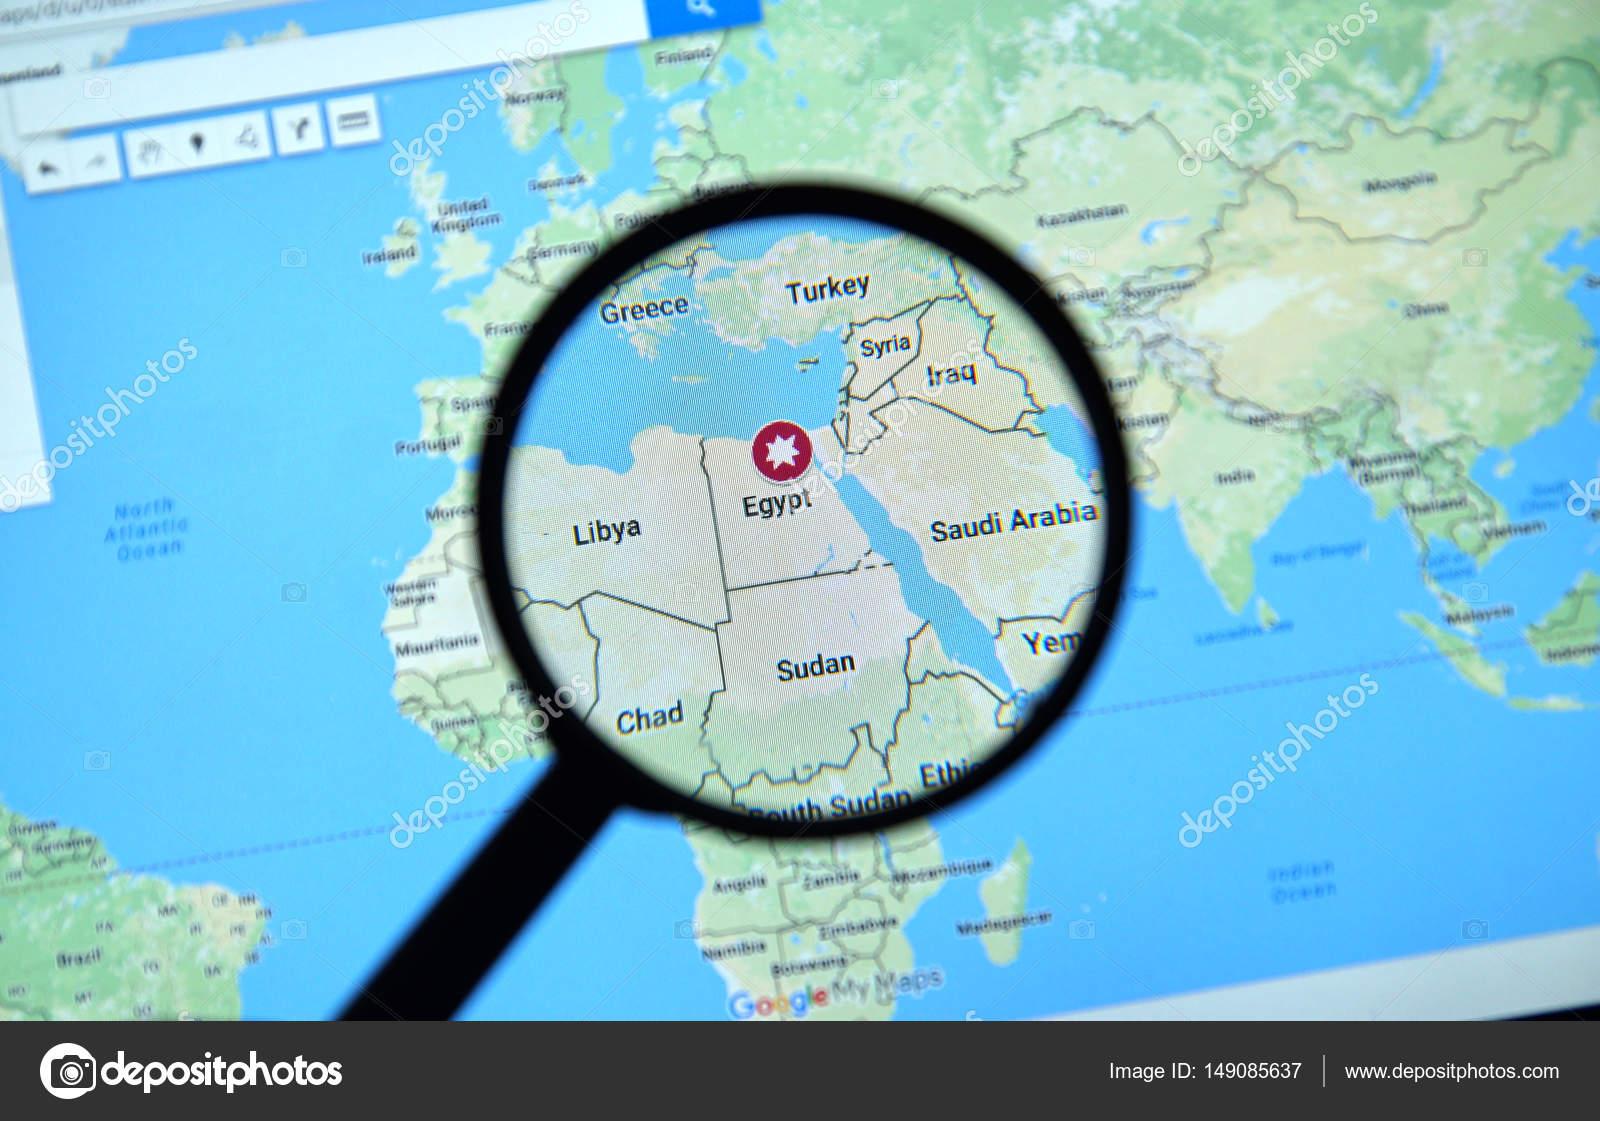 Egypt on google maps stock editorial photo dennizn 149085637 egypt on google maps stock photo gumiabroncs Gallery